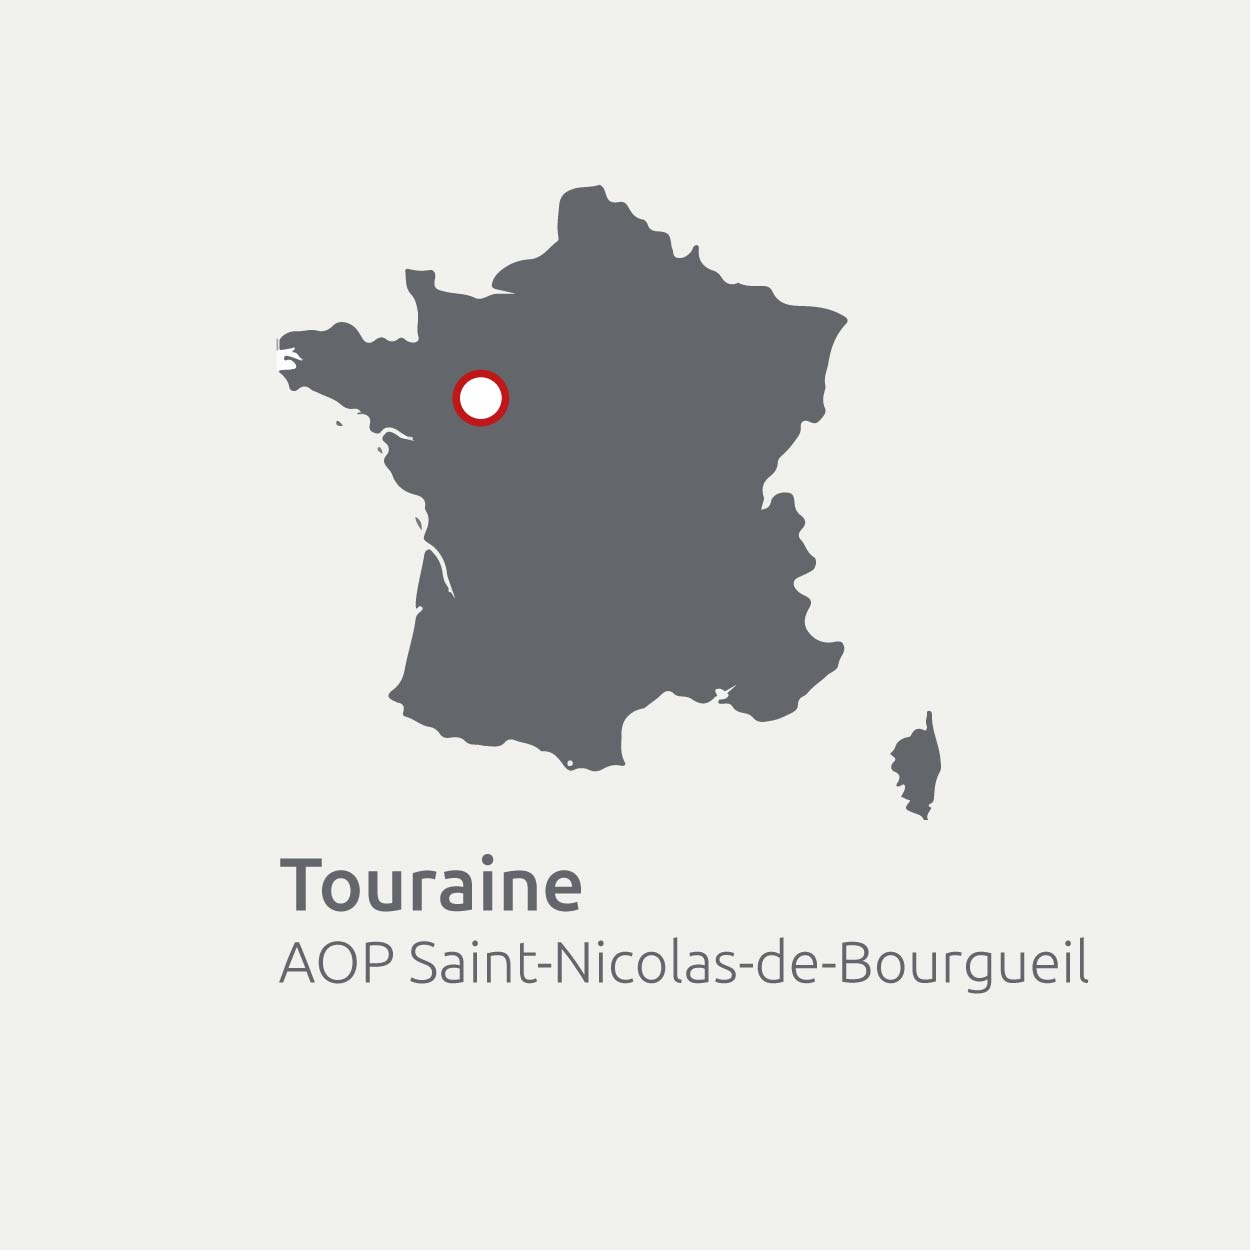 aop_saintnicolasdebourgueil